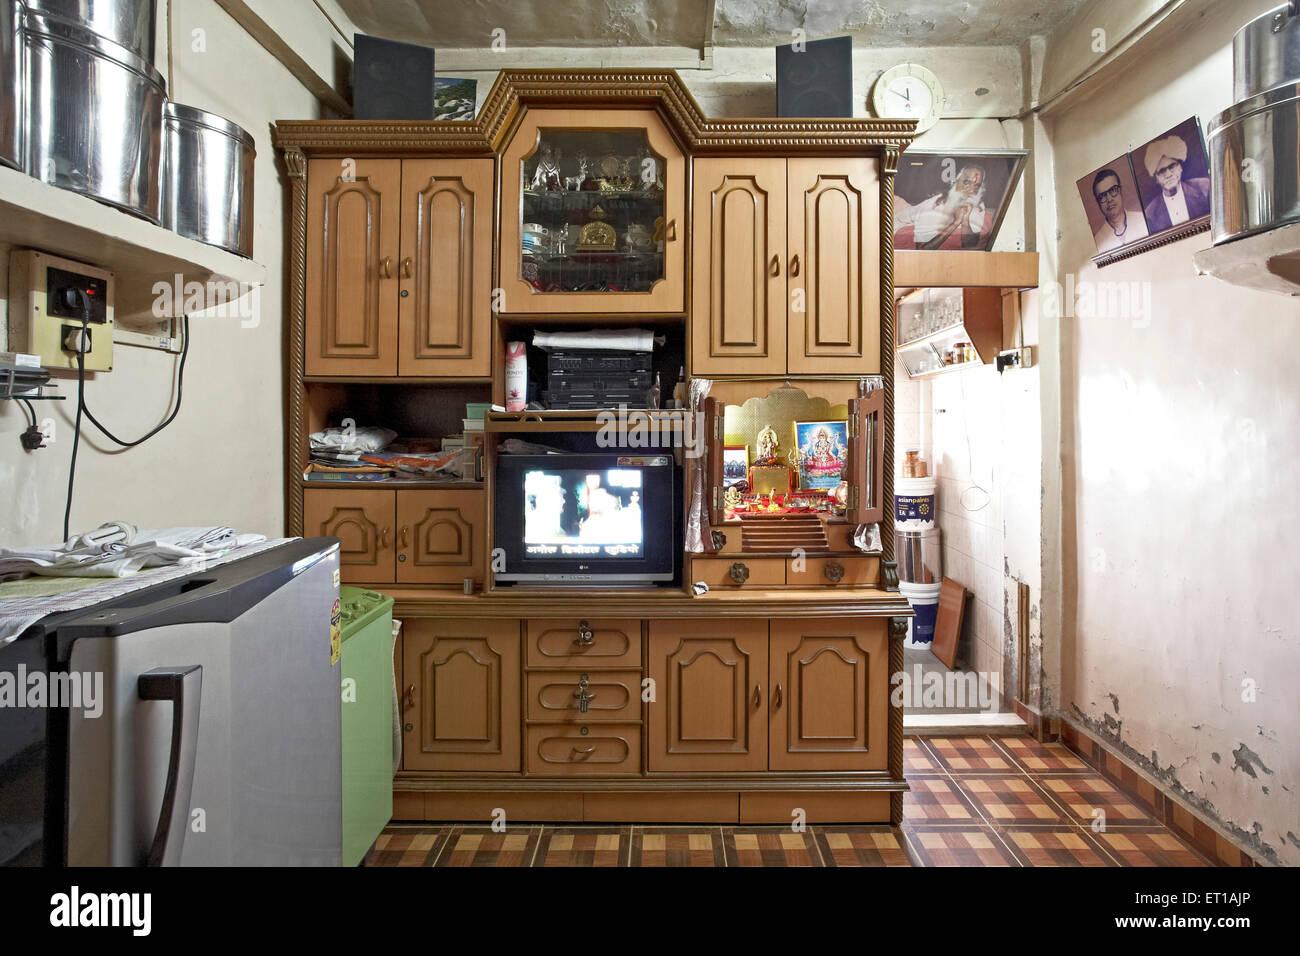 One Room House With Bathroom Textile Mill Chawl Mumbai India Asia Stock Photo Alamy